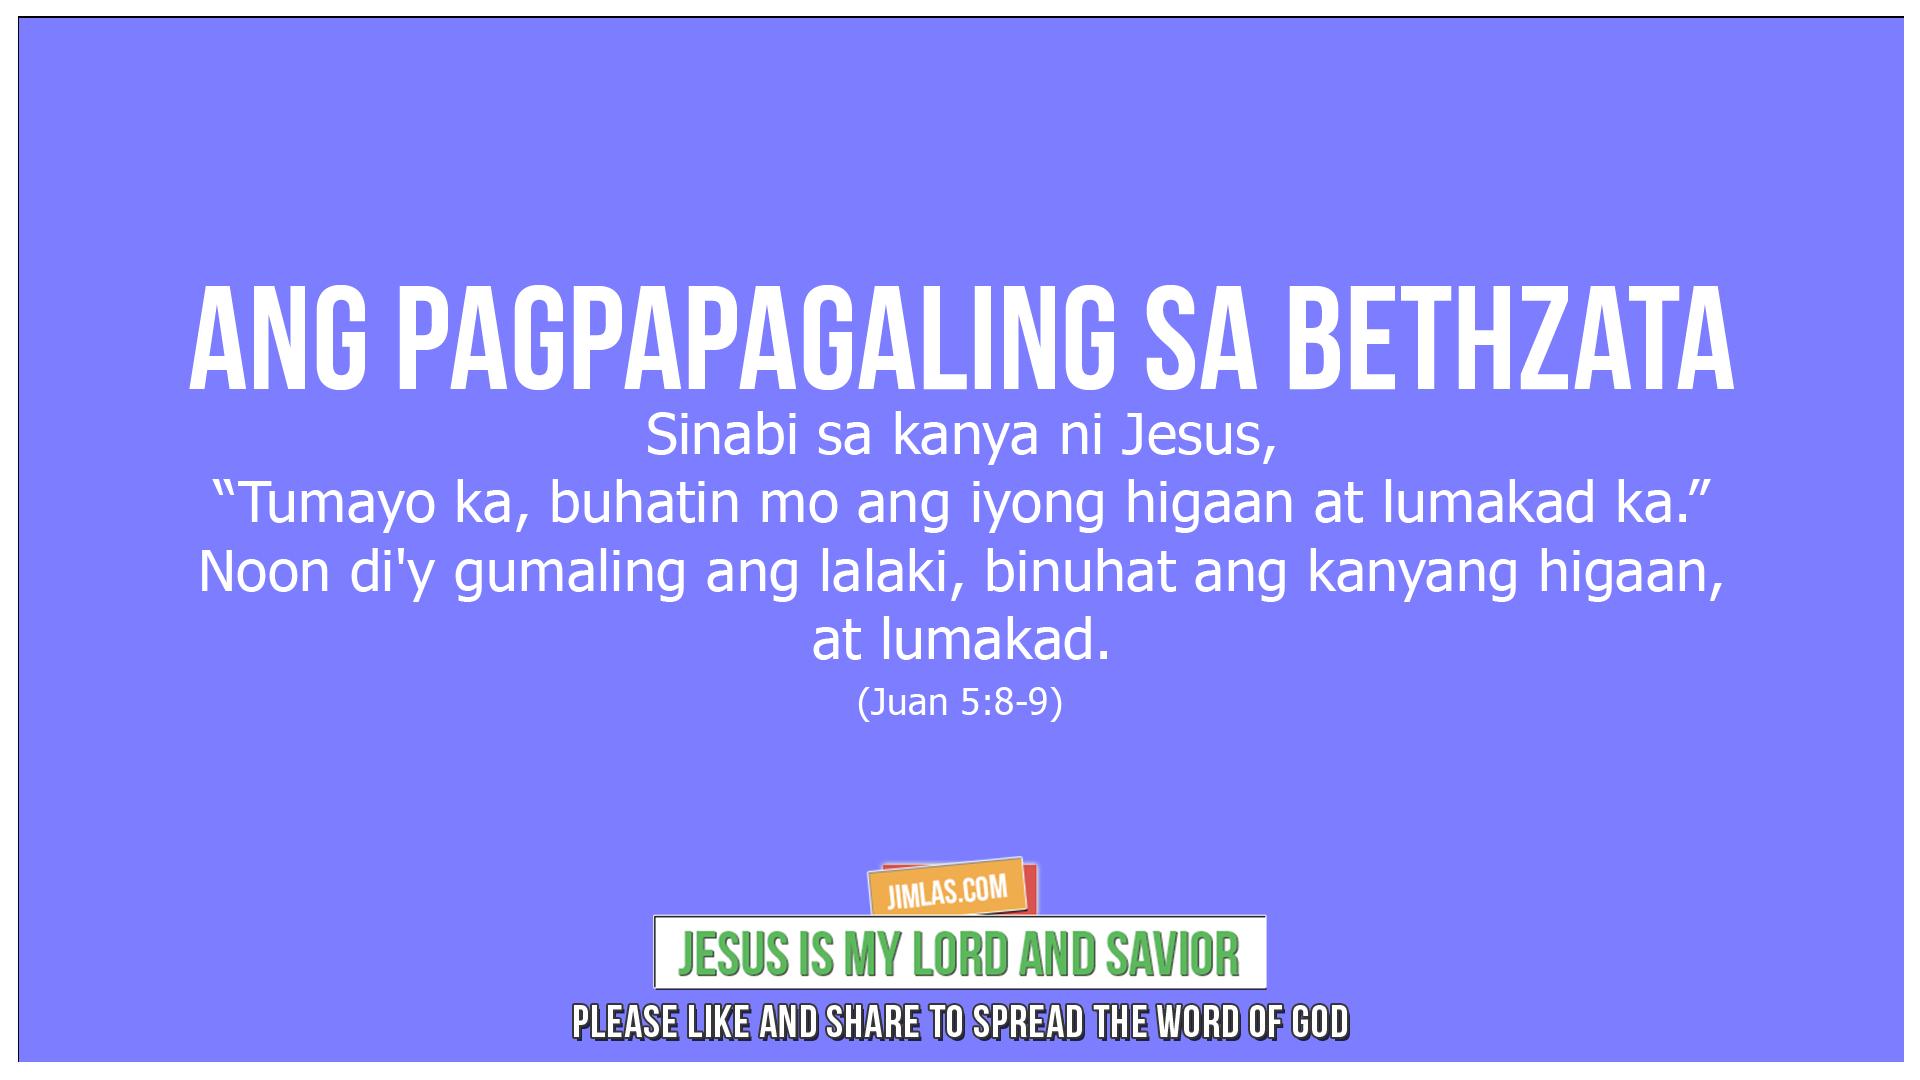 Juan 5 8-9, Juan 5:8-9